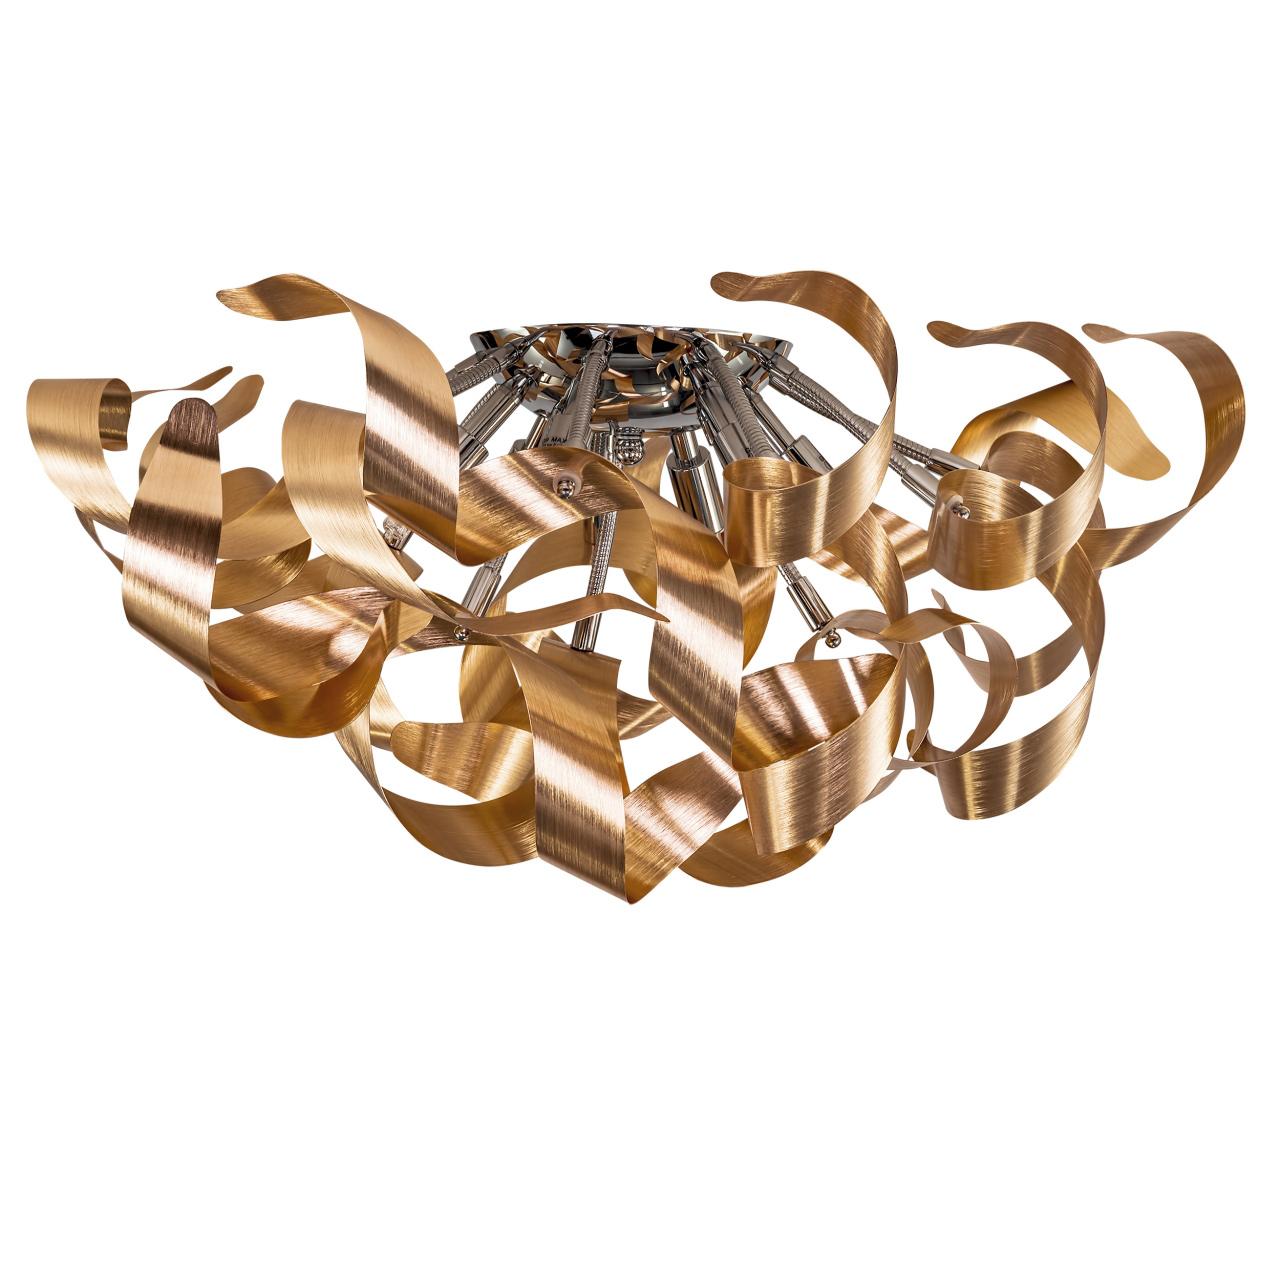 Люстра потолочная Turbio 6х40W G9 светлая медь Lightstar 754061